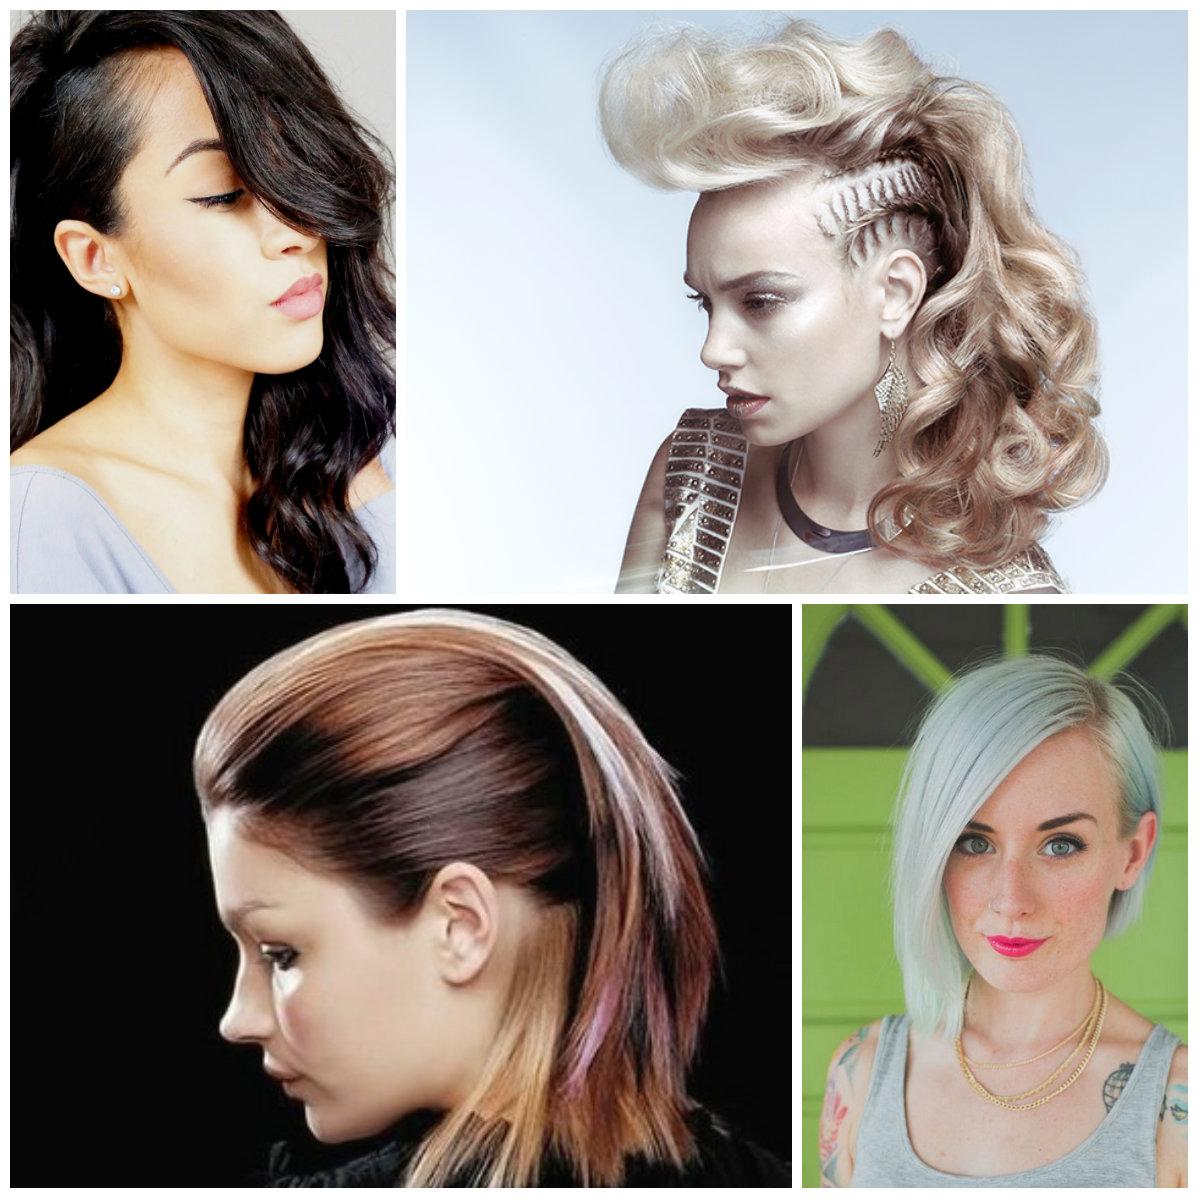 Penteado único Ideias para Cortes de cabelo Médio 2017